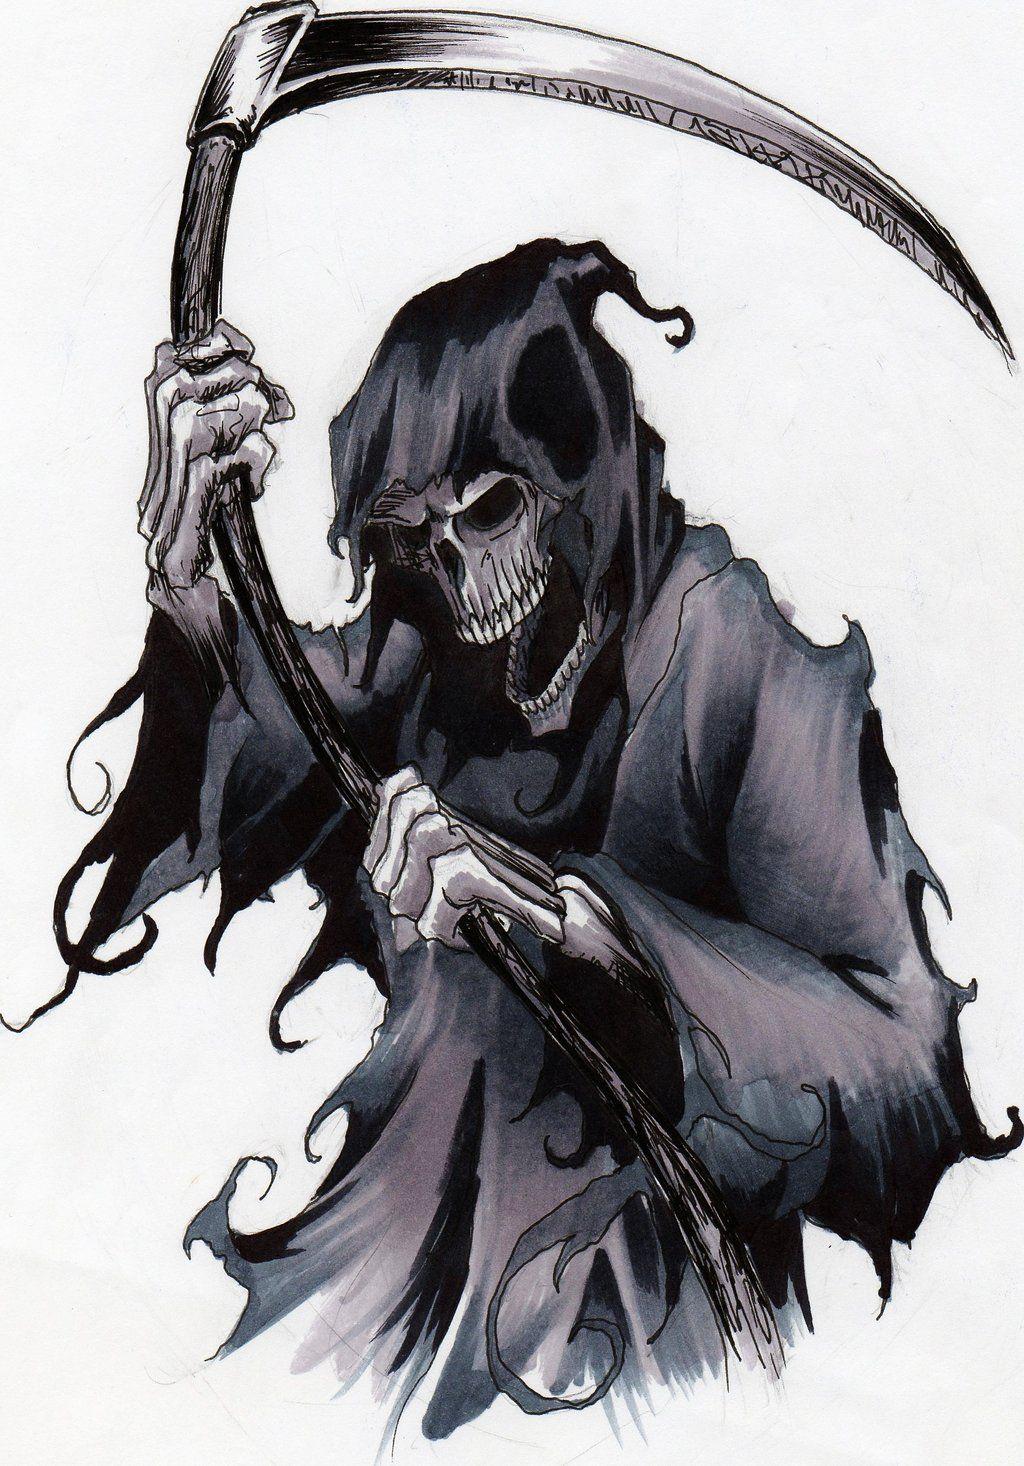 Uncategorized Reaper Drawings reaper by yacobucci on deviantart tattoo drawings drawings